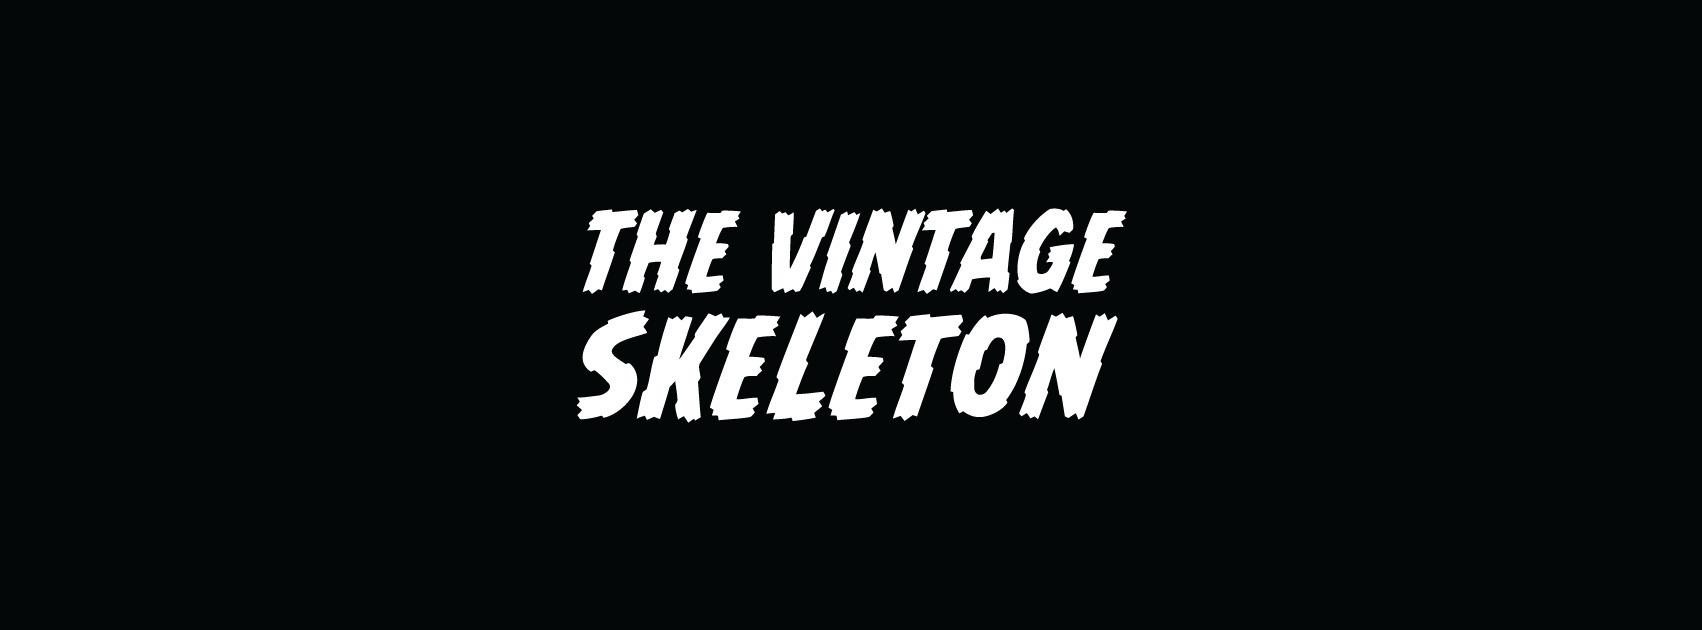 Michael V. Skeleton Gramling (@thevintageskeleton) Cover Image